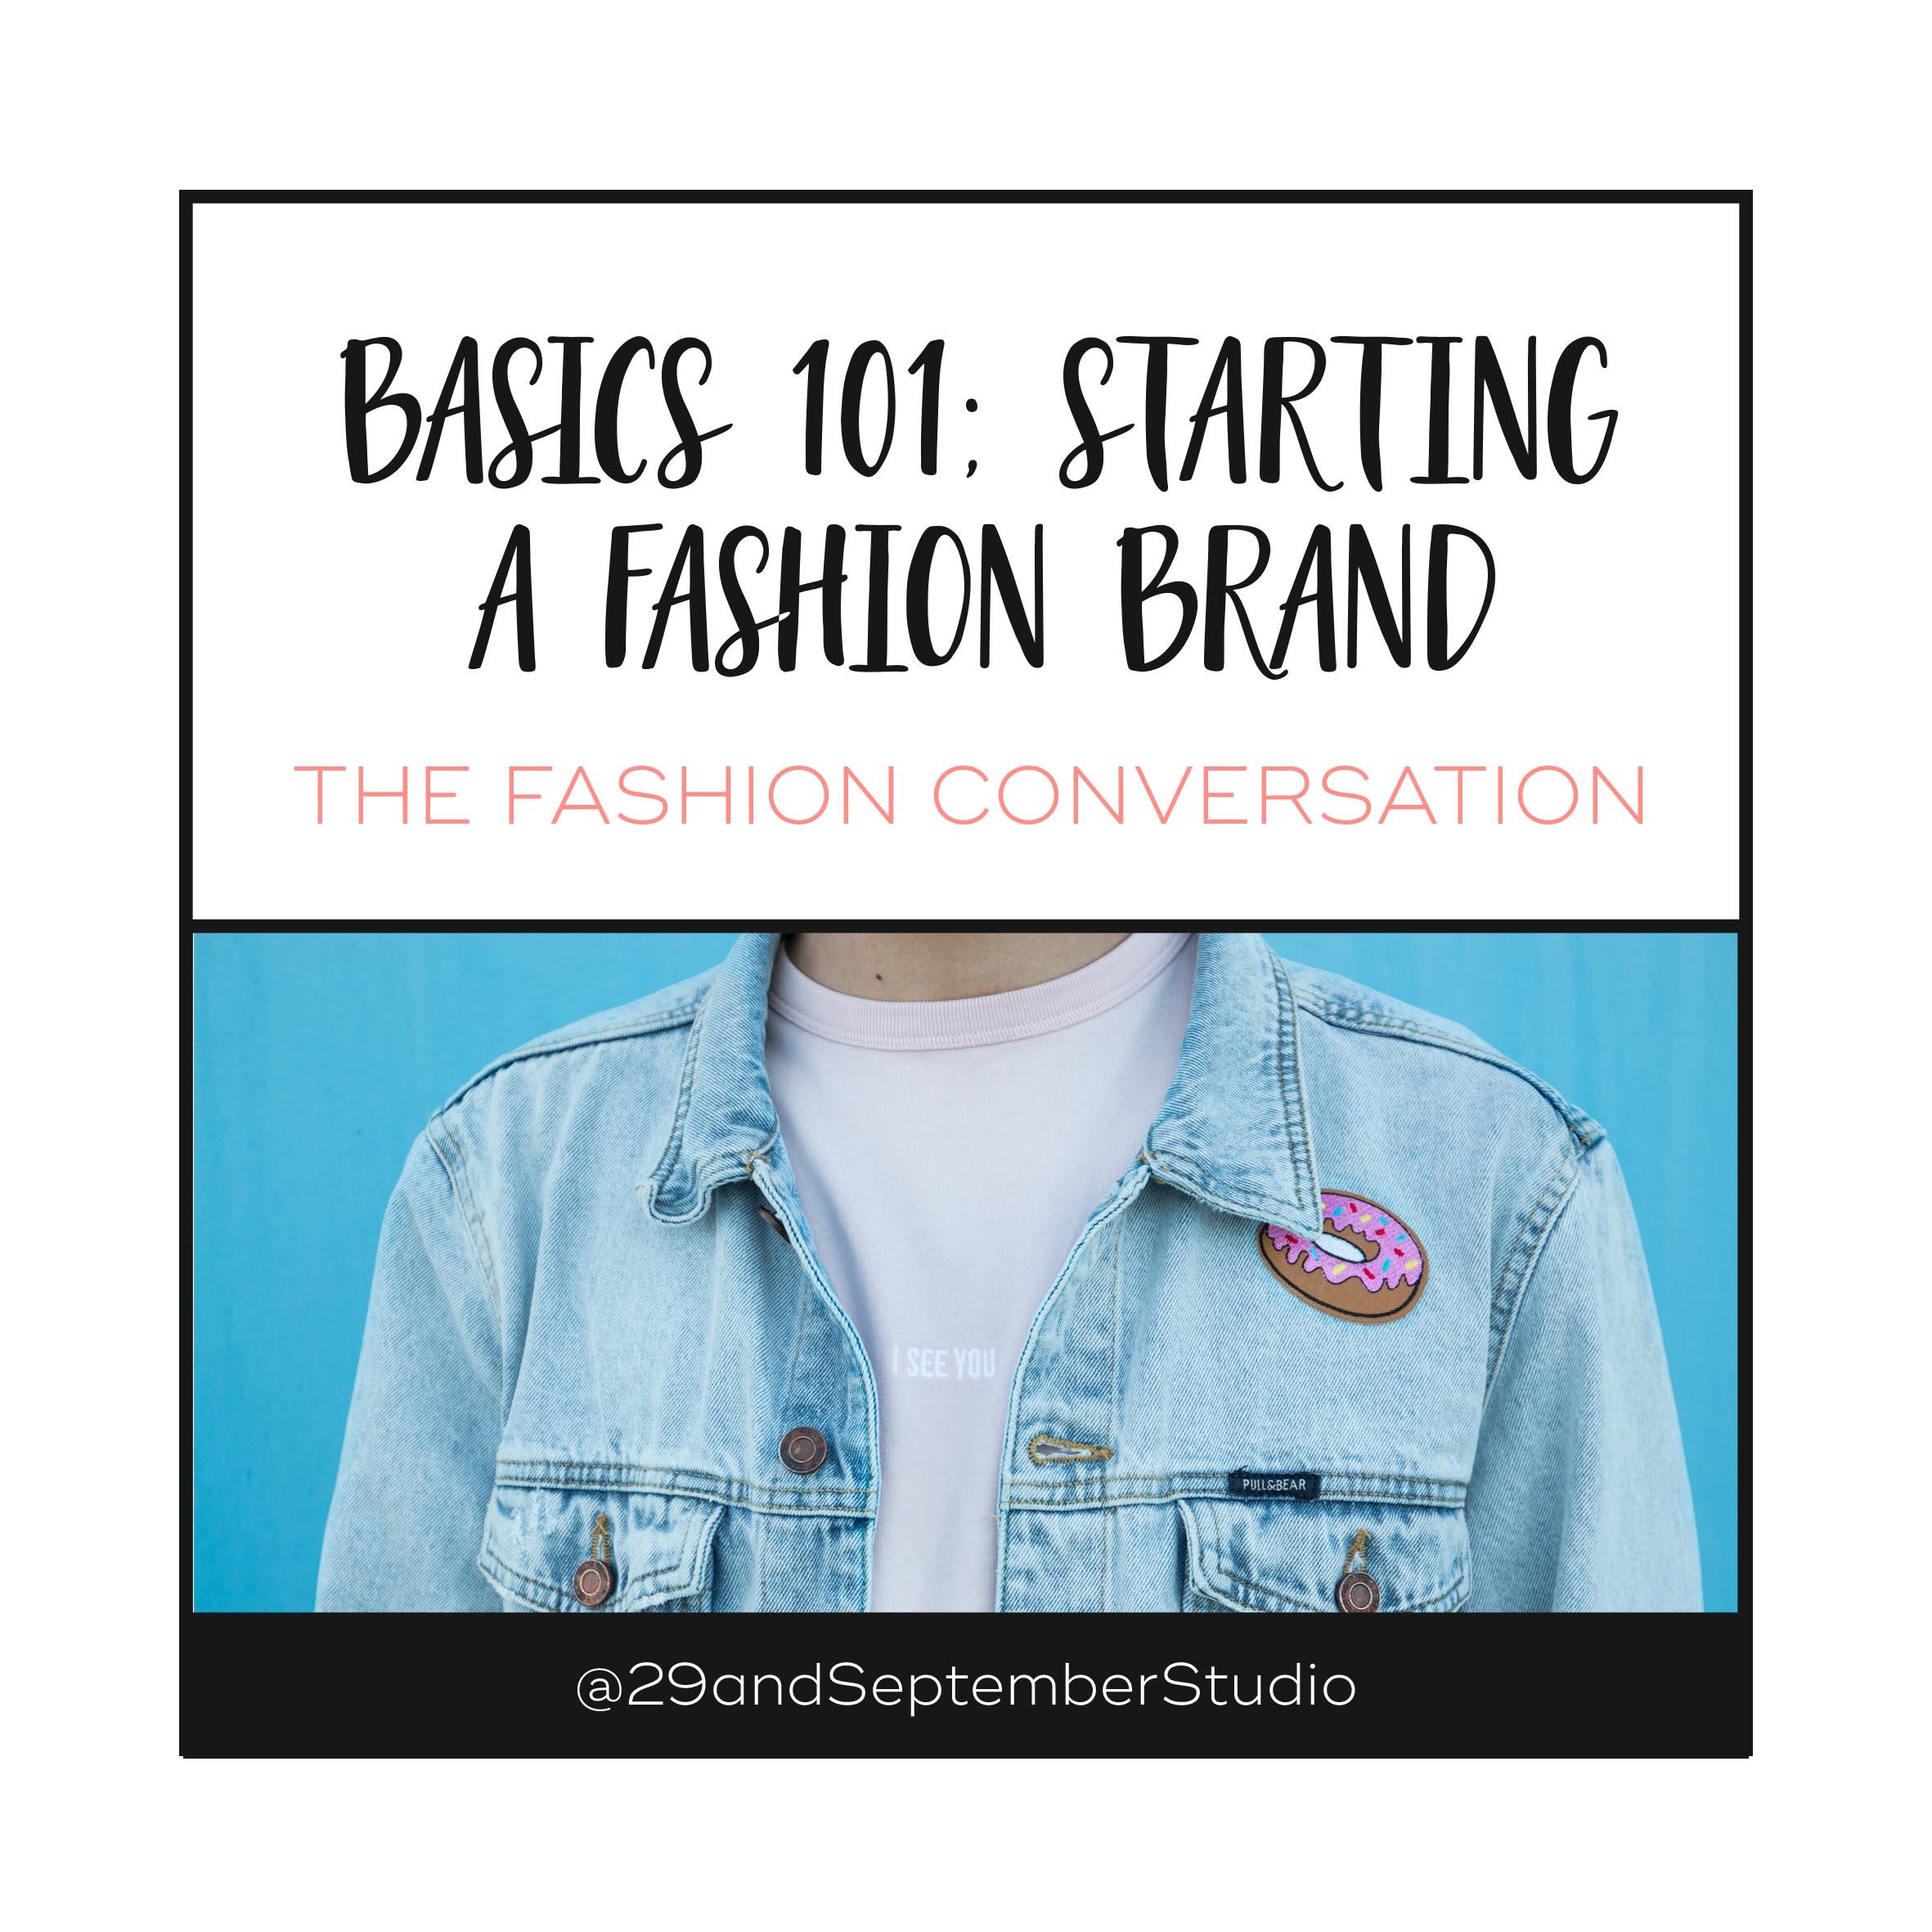 Basics 101 Series